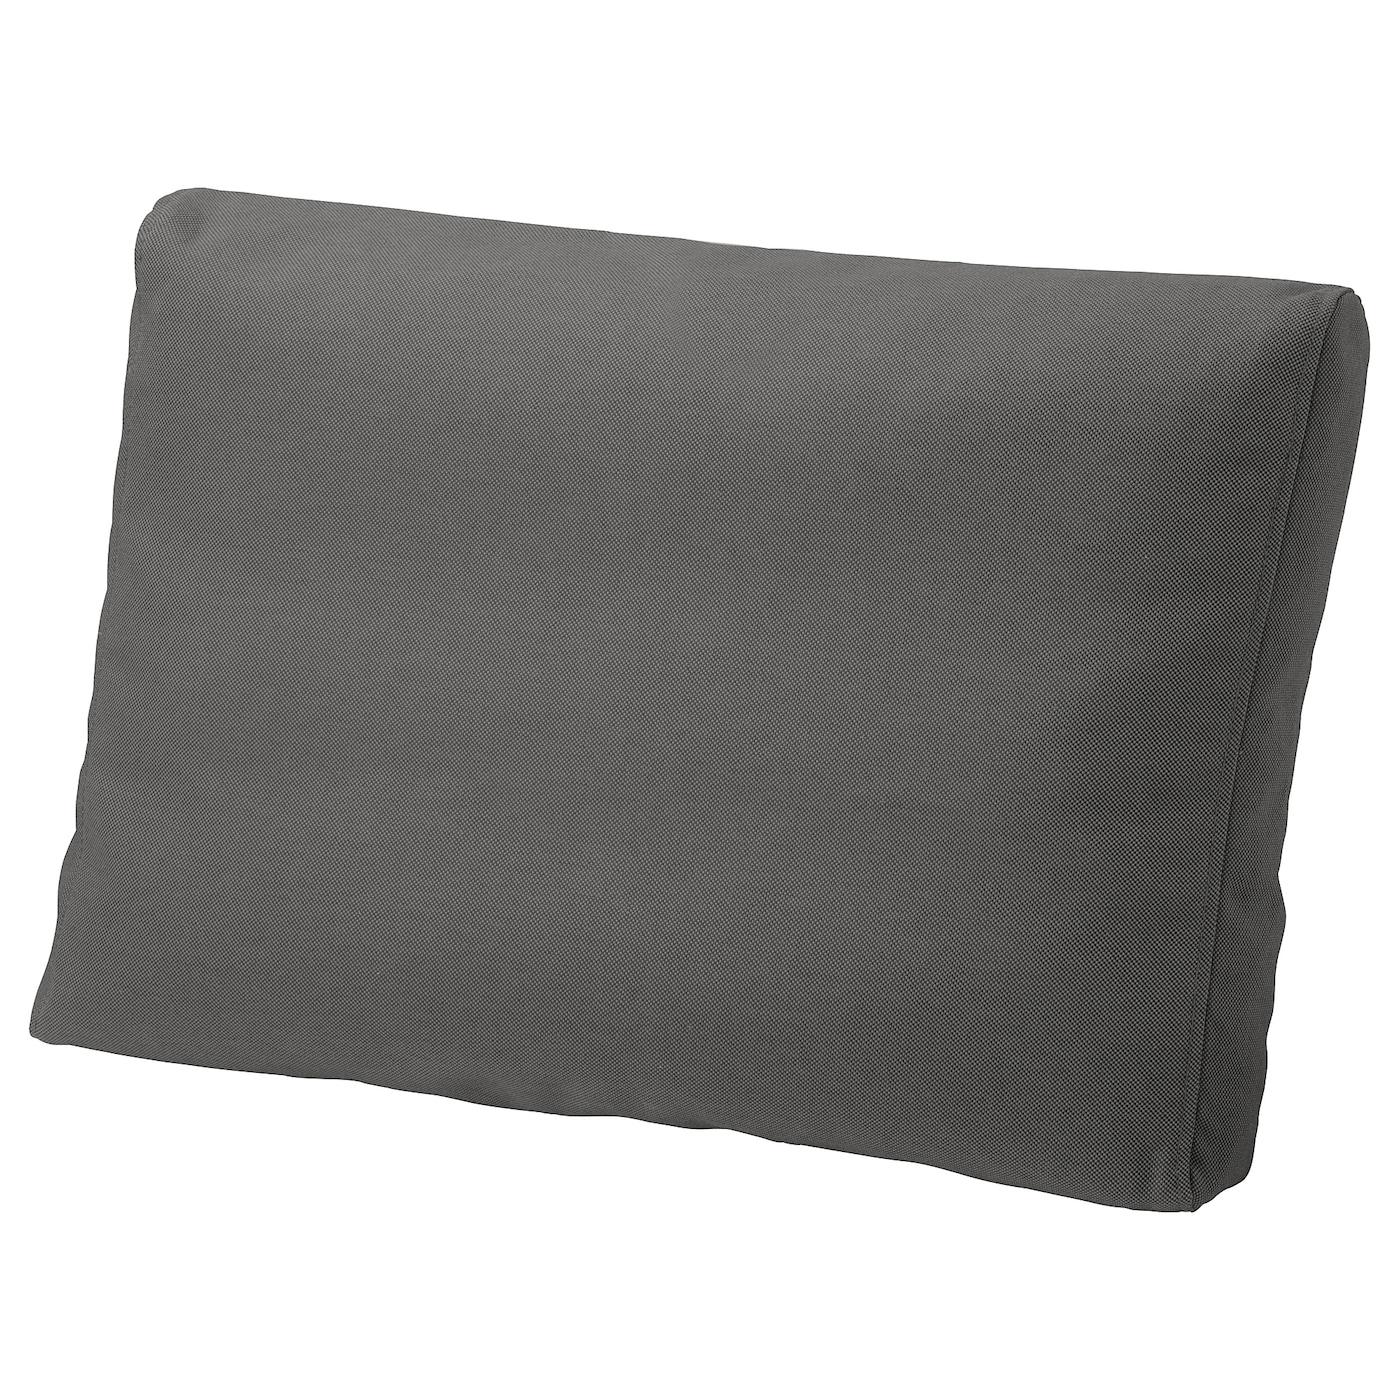 FRÖSÖN/DUVHOLMEN Back cushion, outdoor - dark grey 9x9 cm